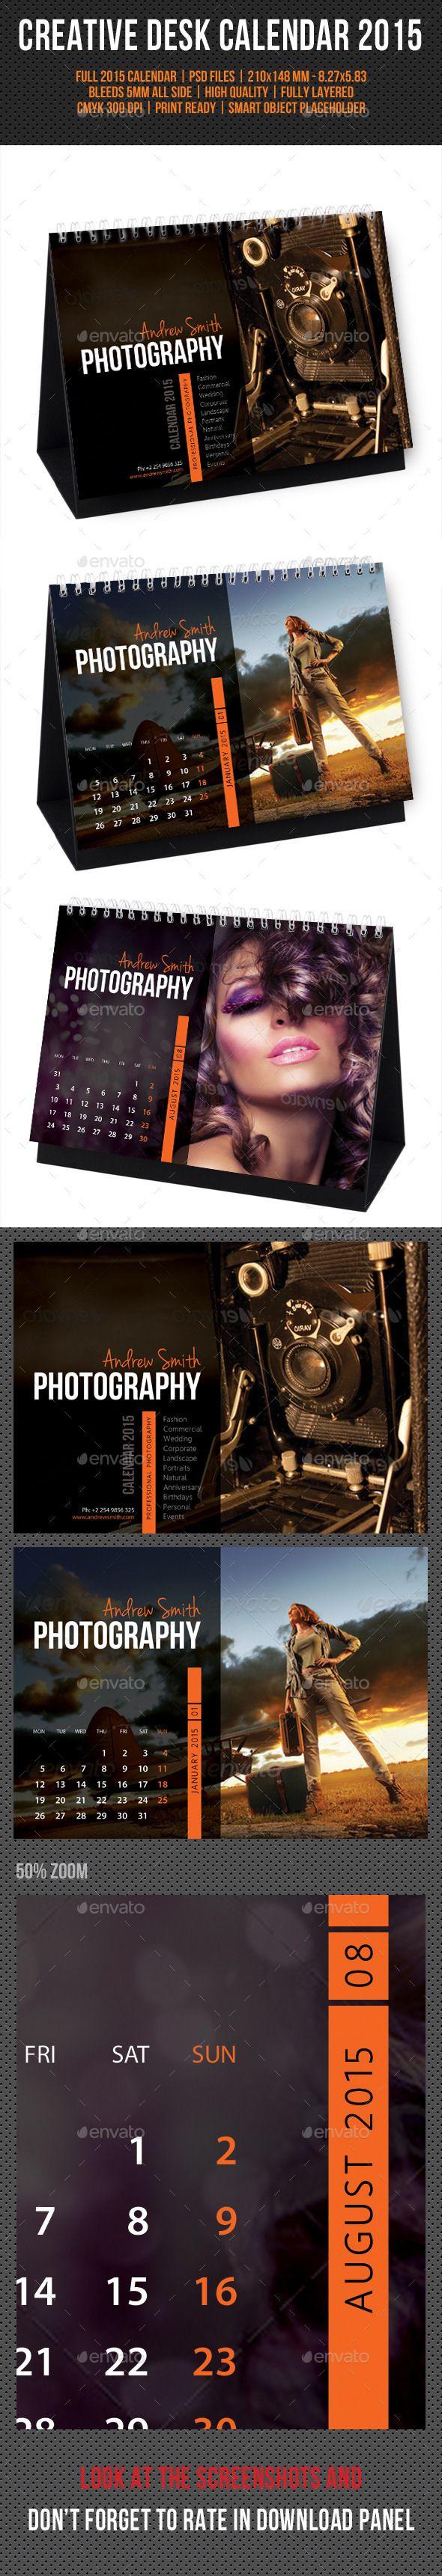 Creative Desk Calendar 2015 Template | Buy and Download: http://graphicriver.net/item/creative-desk-calendar-2015-v10/9846401?ref=ksioks